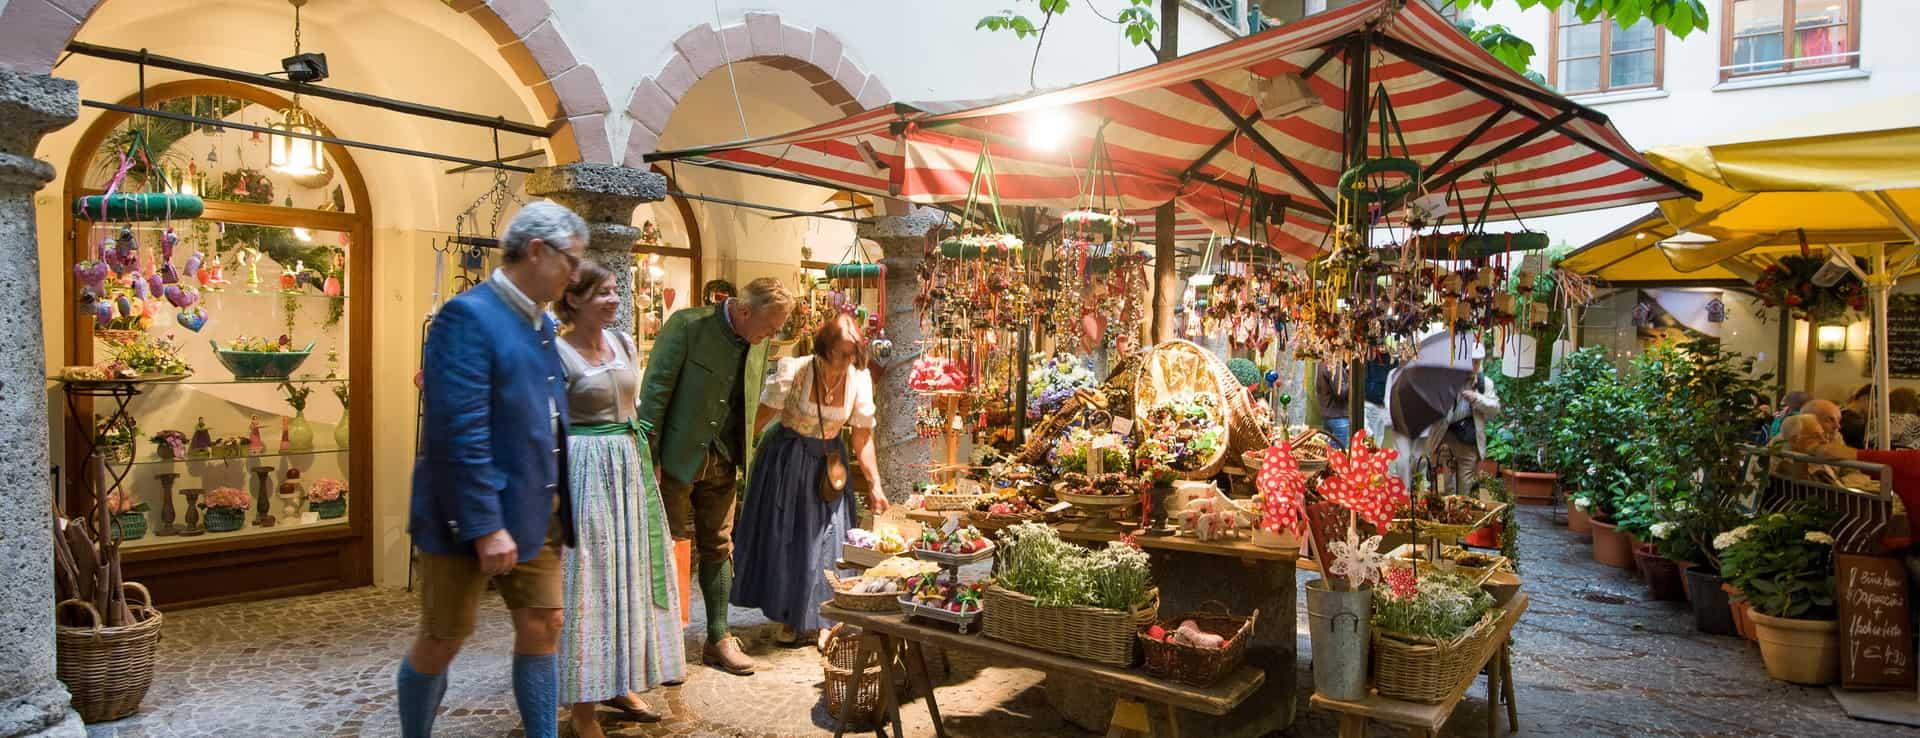 Shopping i Salzburgs gamla stan Semester i Österrike